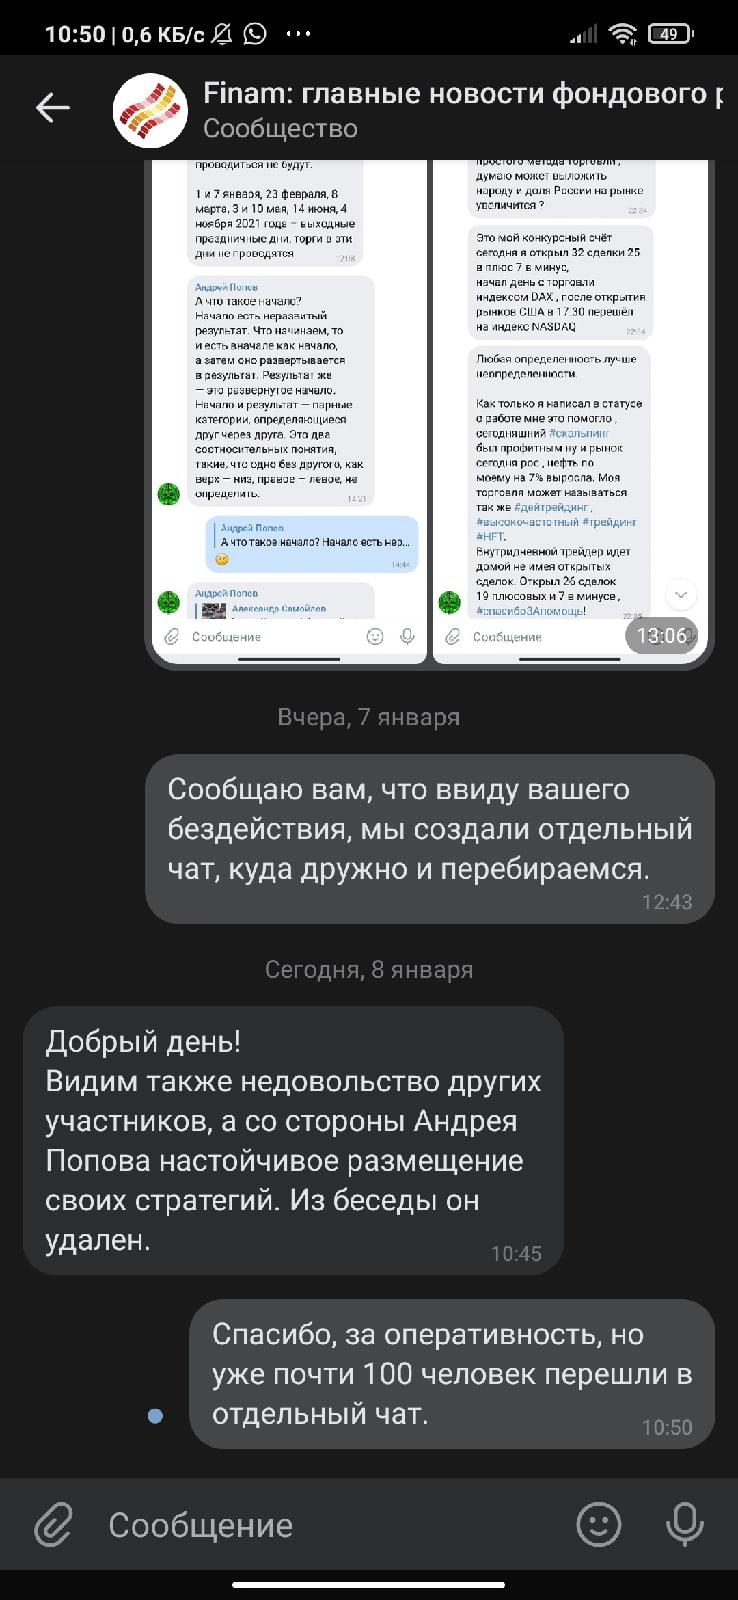 https://files.comon.ru/25ha9rw8yt1vbcjzmplb0q7gzsa9d4ui871rlmpe42c5887z2r.jpg